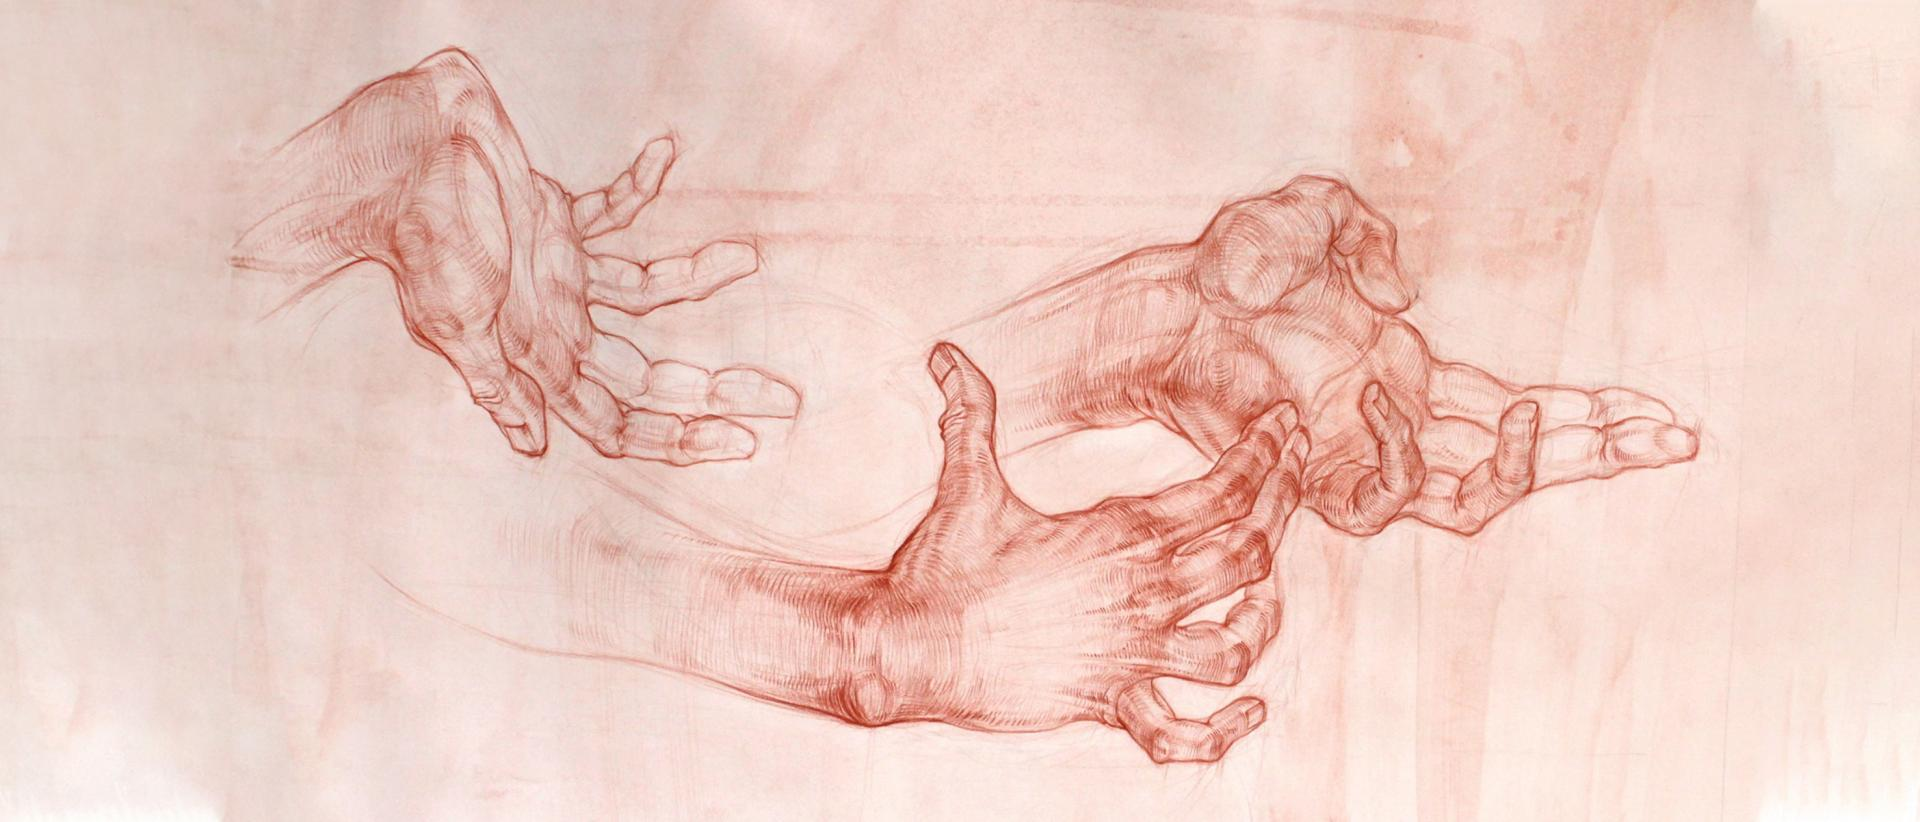 Работа студента курса Рисунок